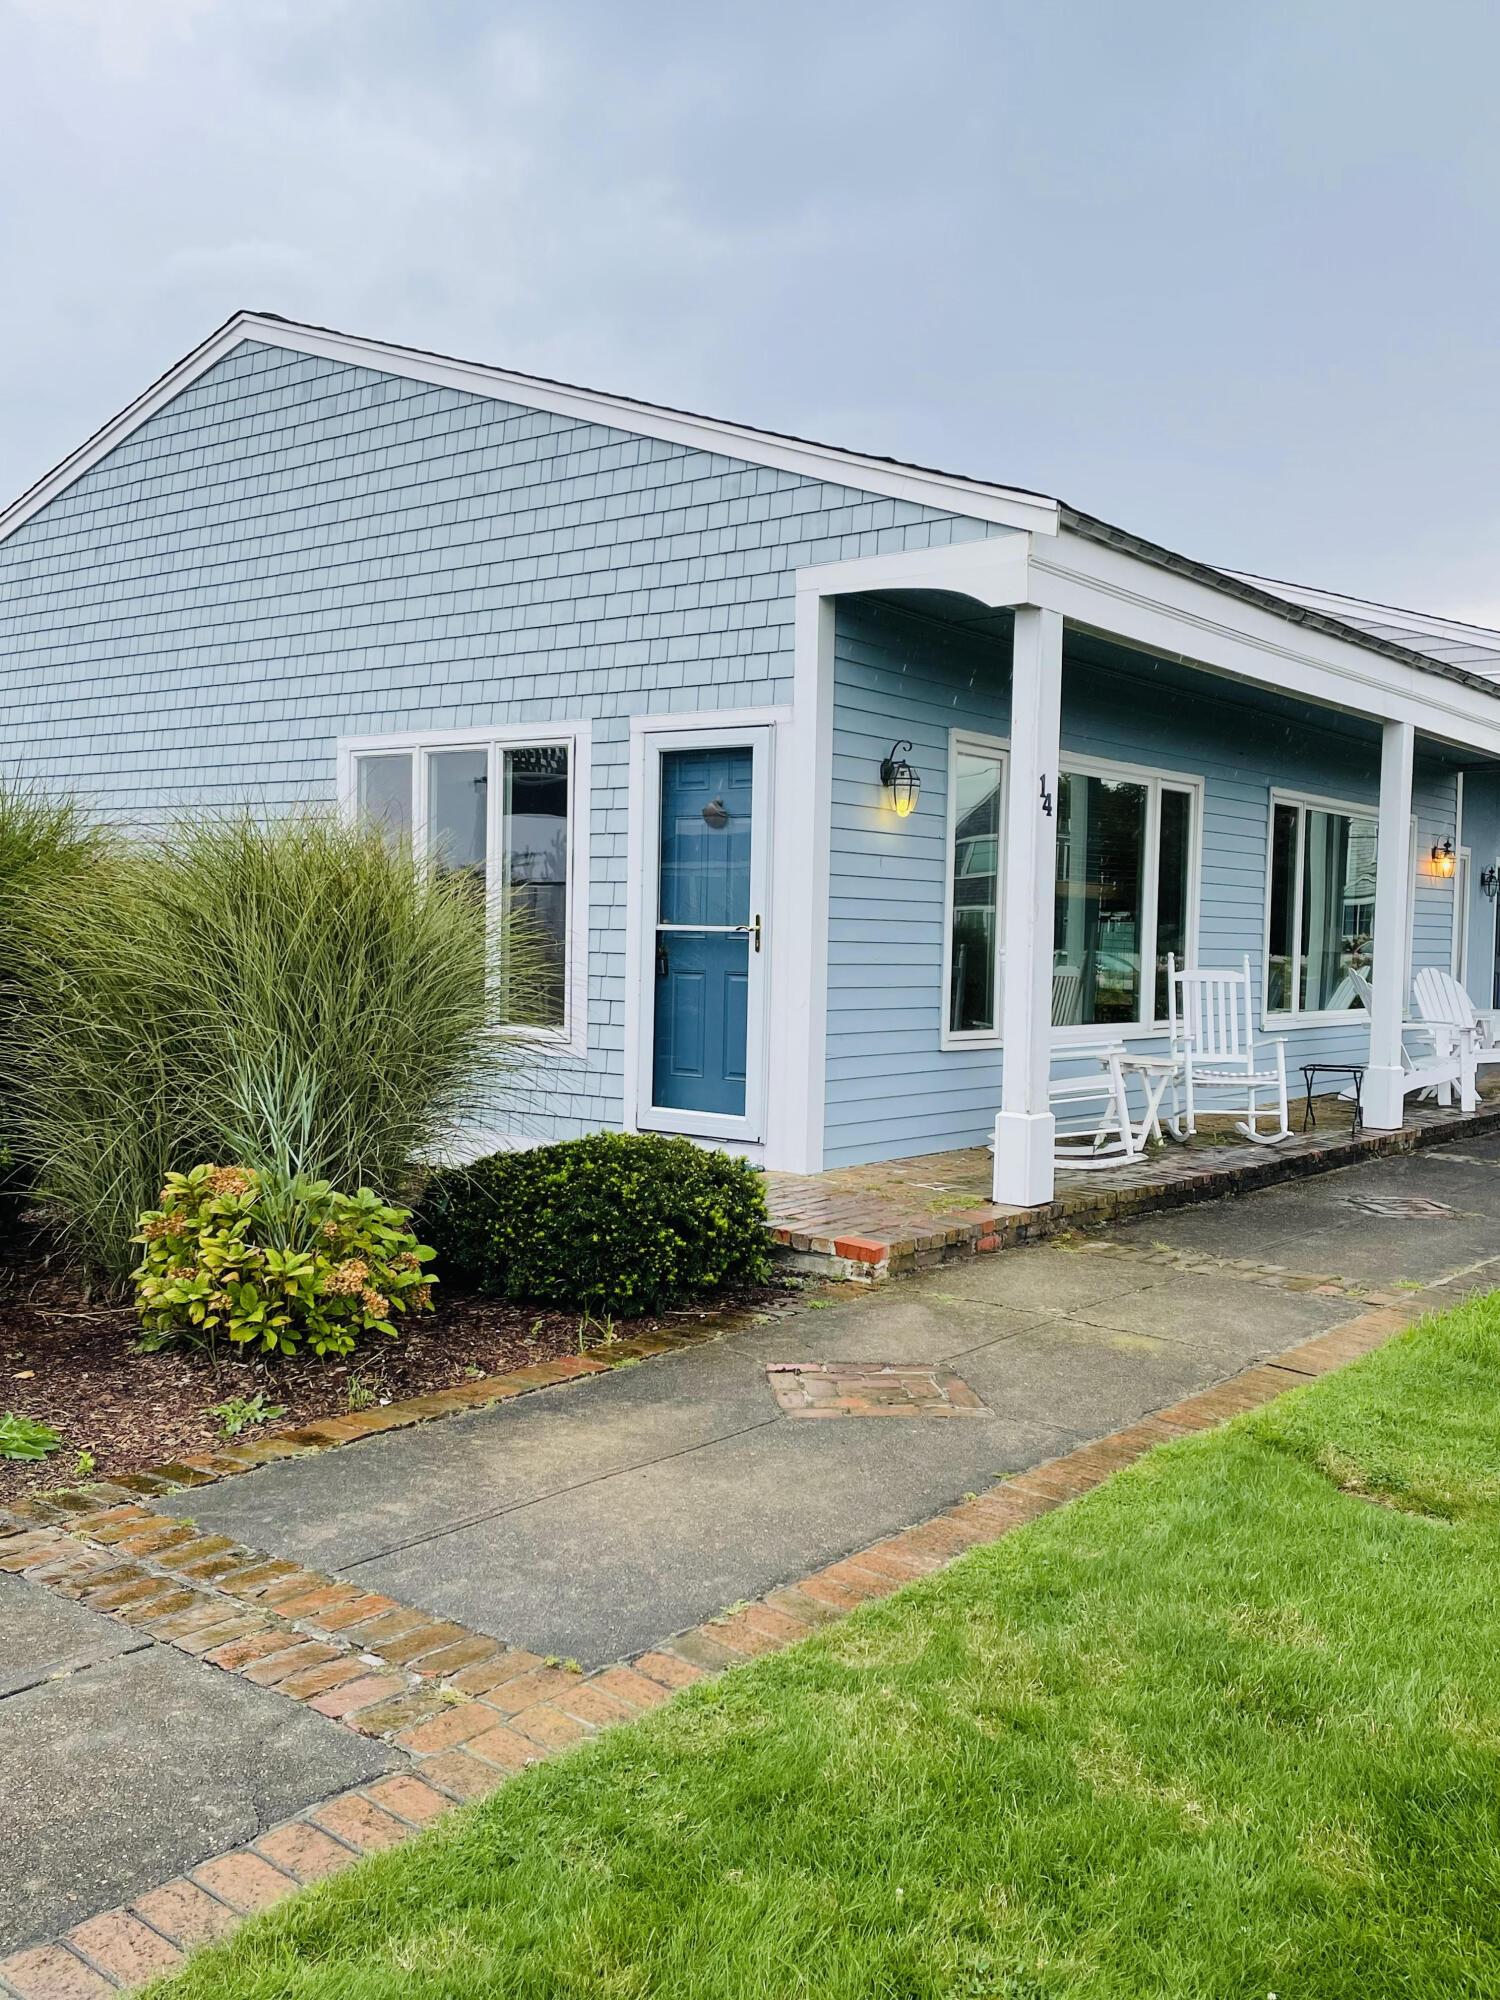 14 Starfish Lane, Chatham MA, 02633